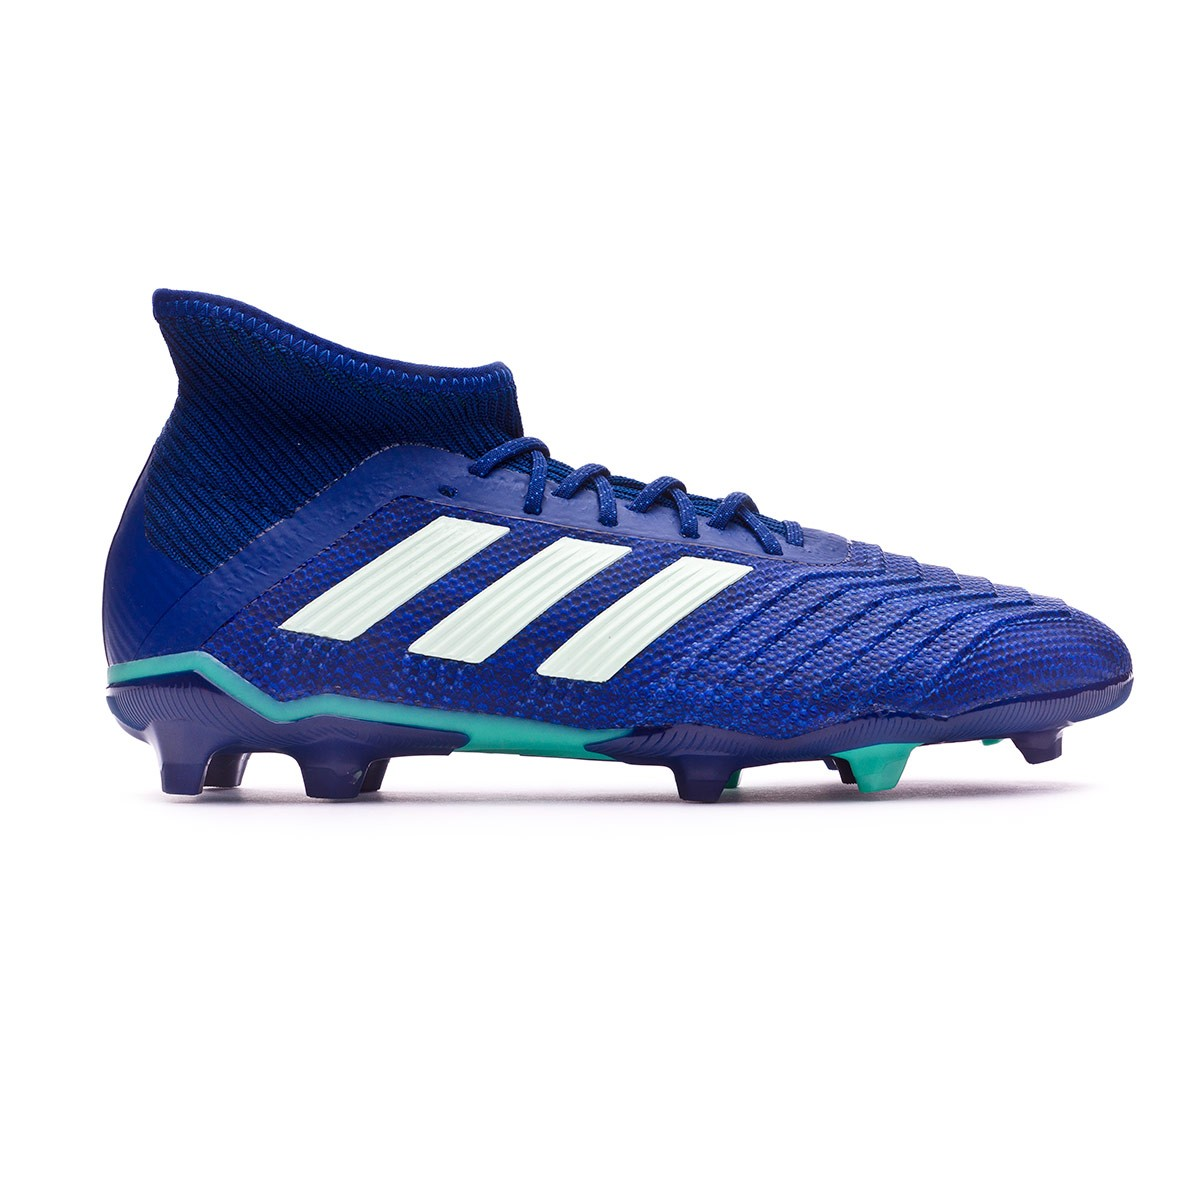 78e867d48df9 Chaussure de foot adidas Predator 18.1 FG enfant Unity ink-Aero green-Hi-res  green - Boutique de football Fútbol Emotion